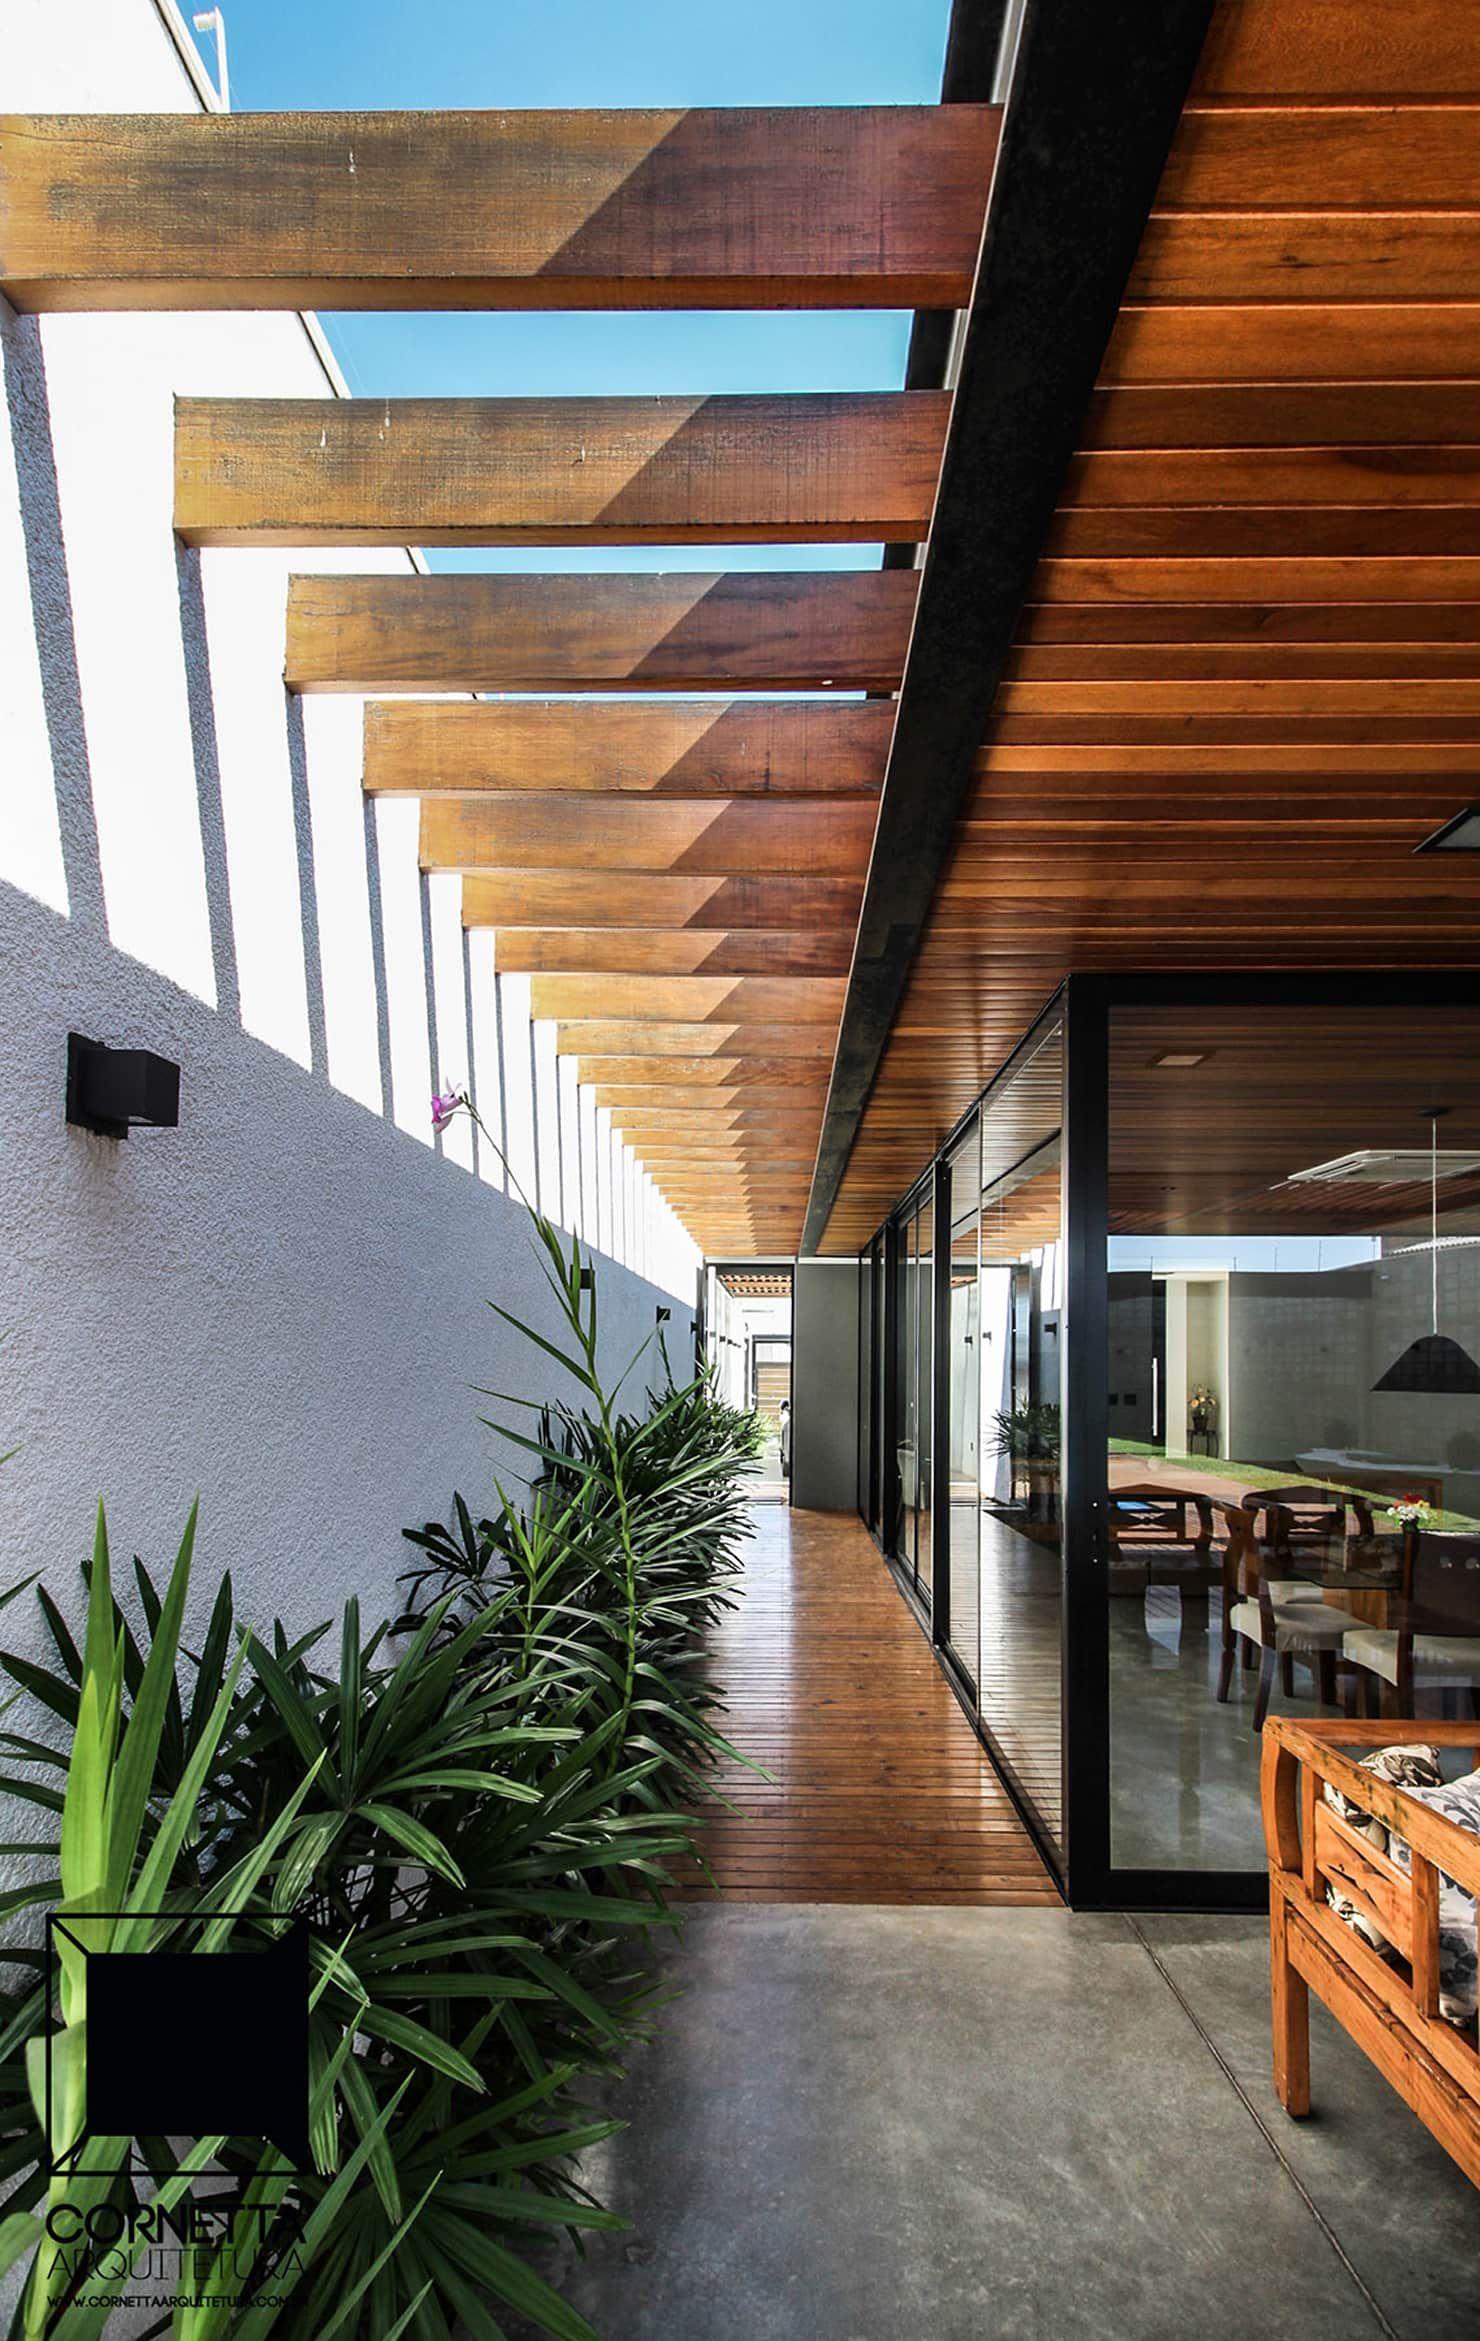 Cornetta Arquitetura